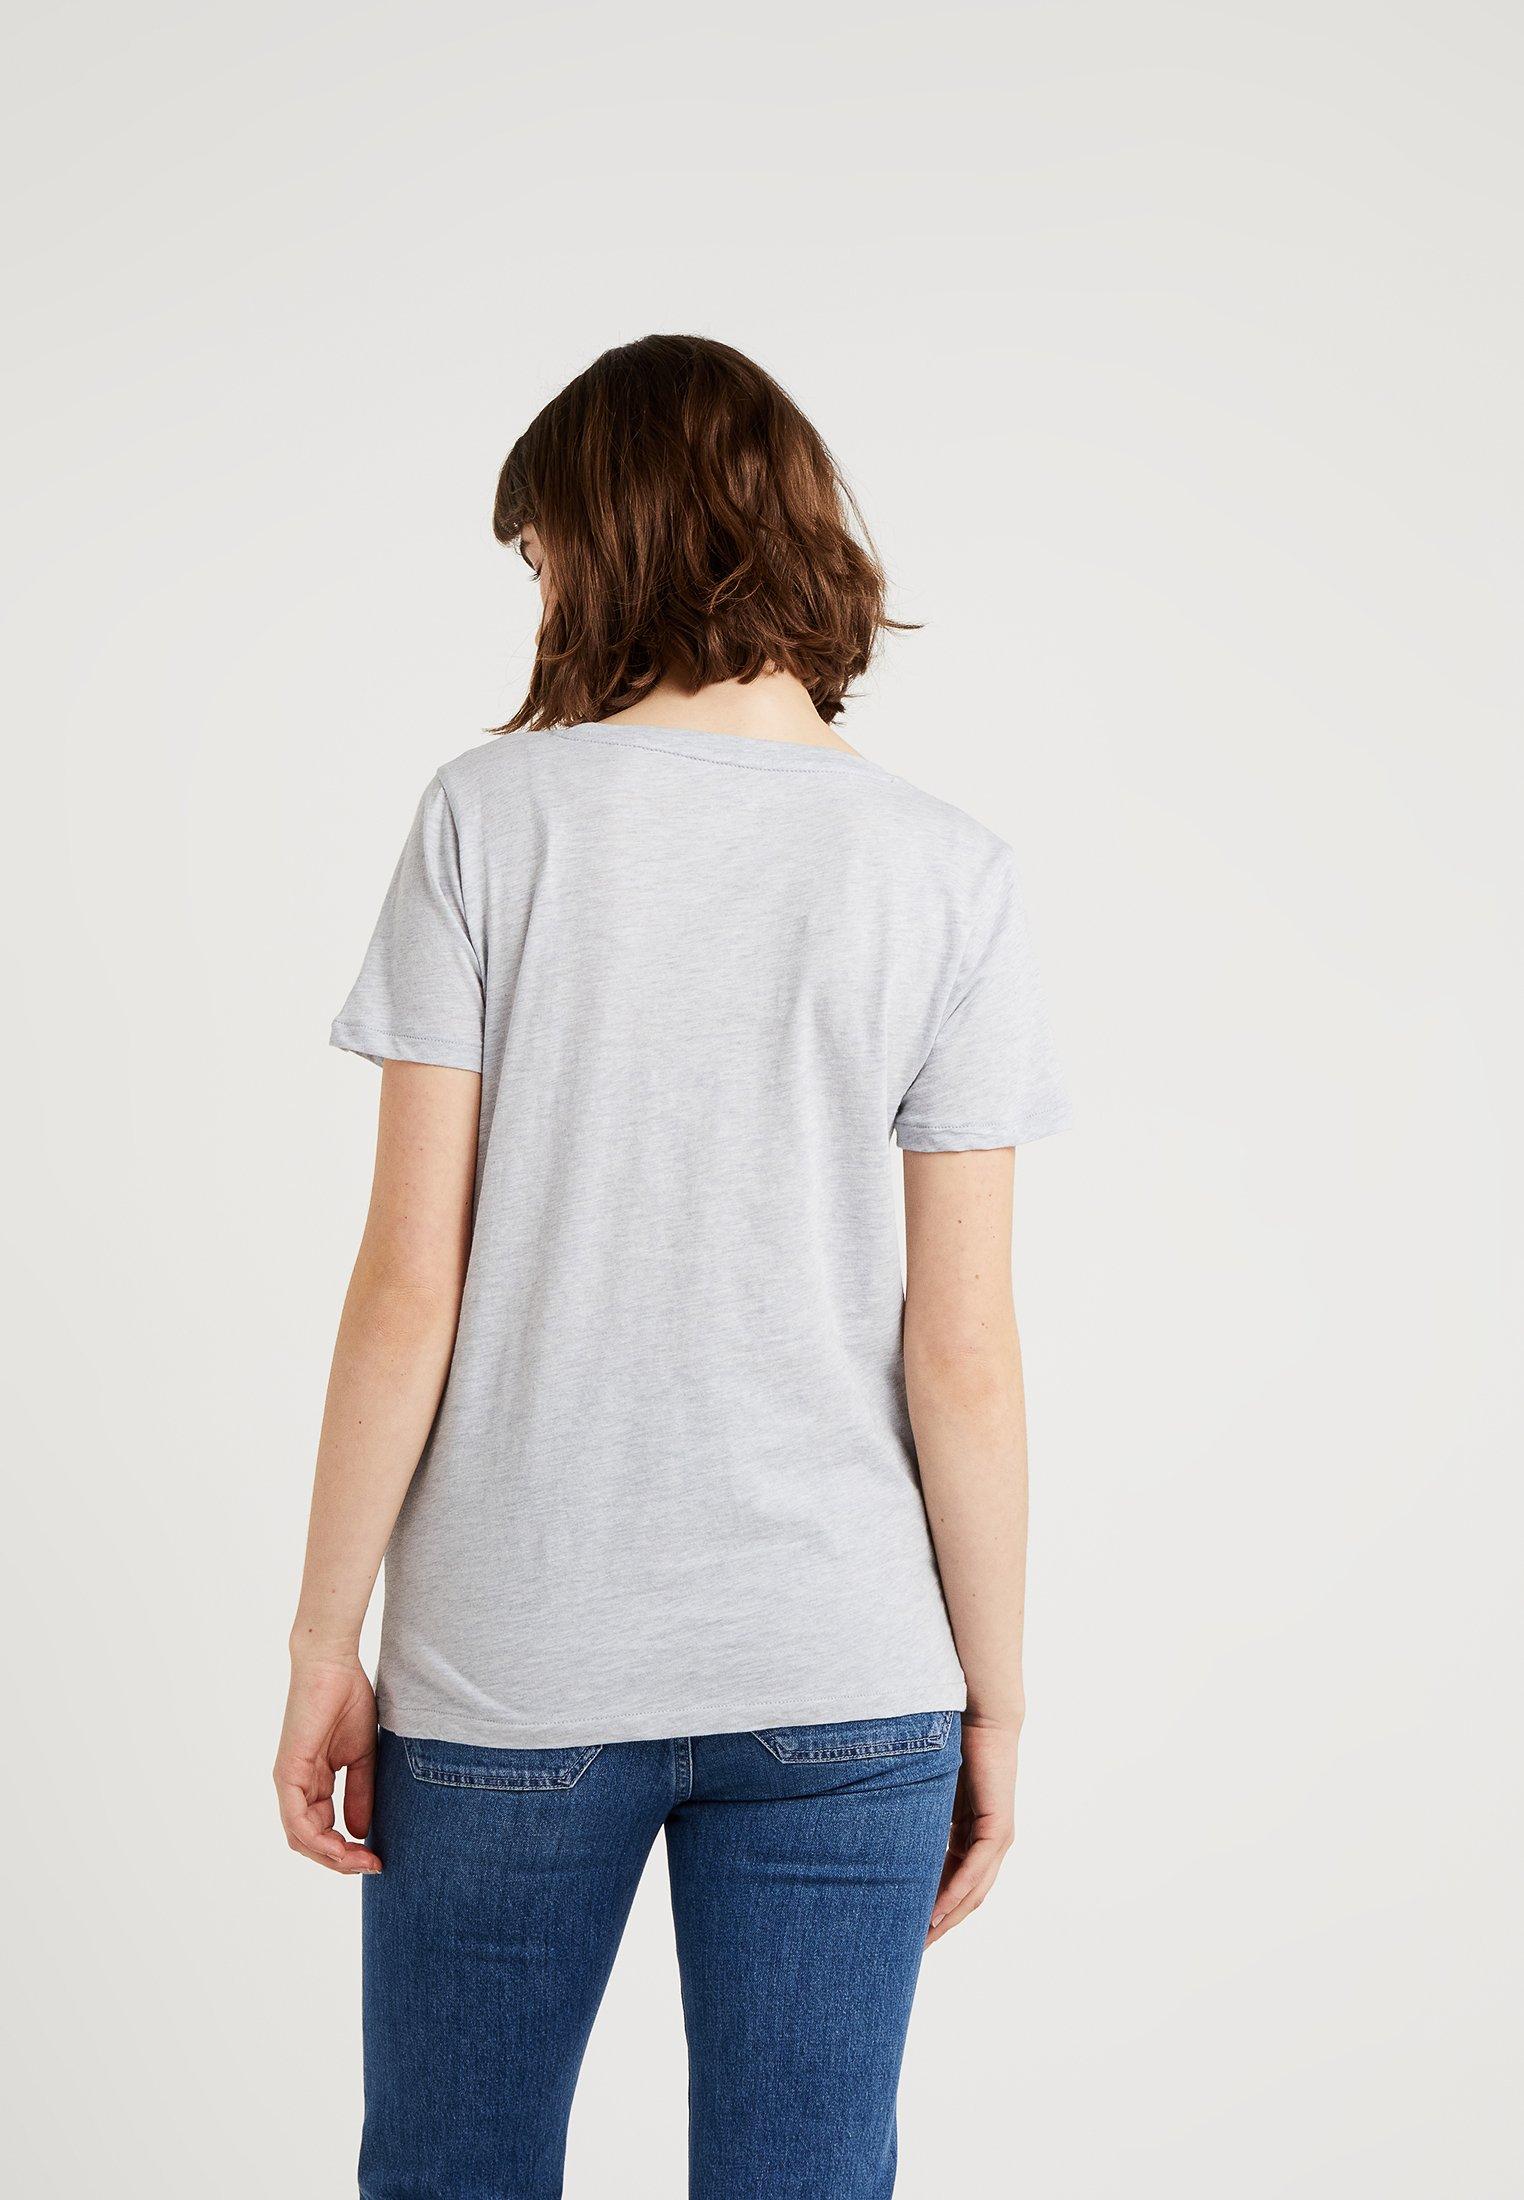 J.CREW VINTAGE CREWNECK TEE - T-shirts - navy